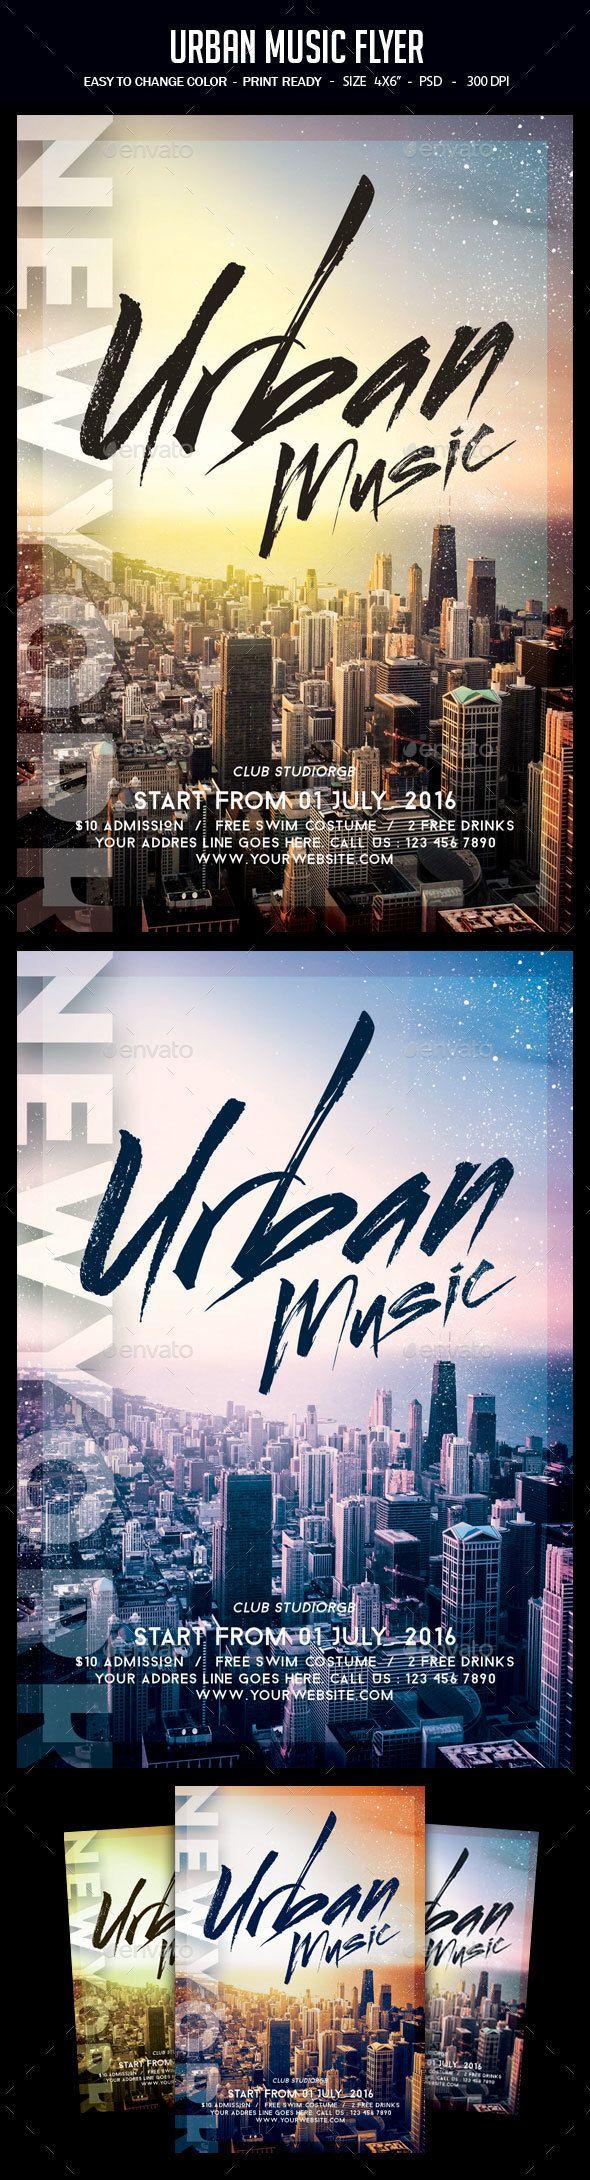 Urban Music Flyer